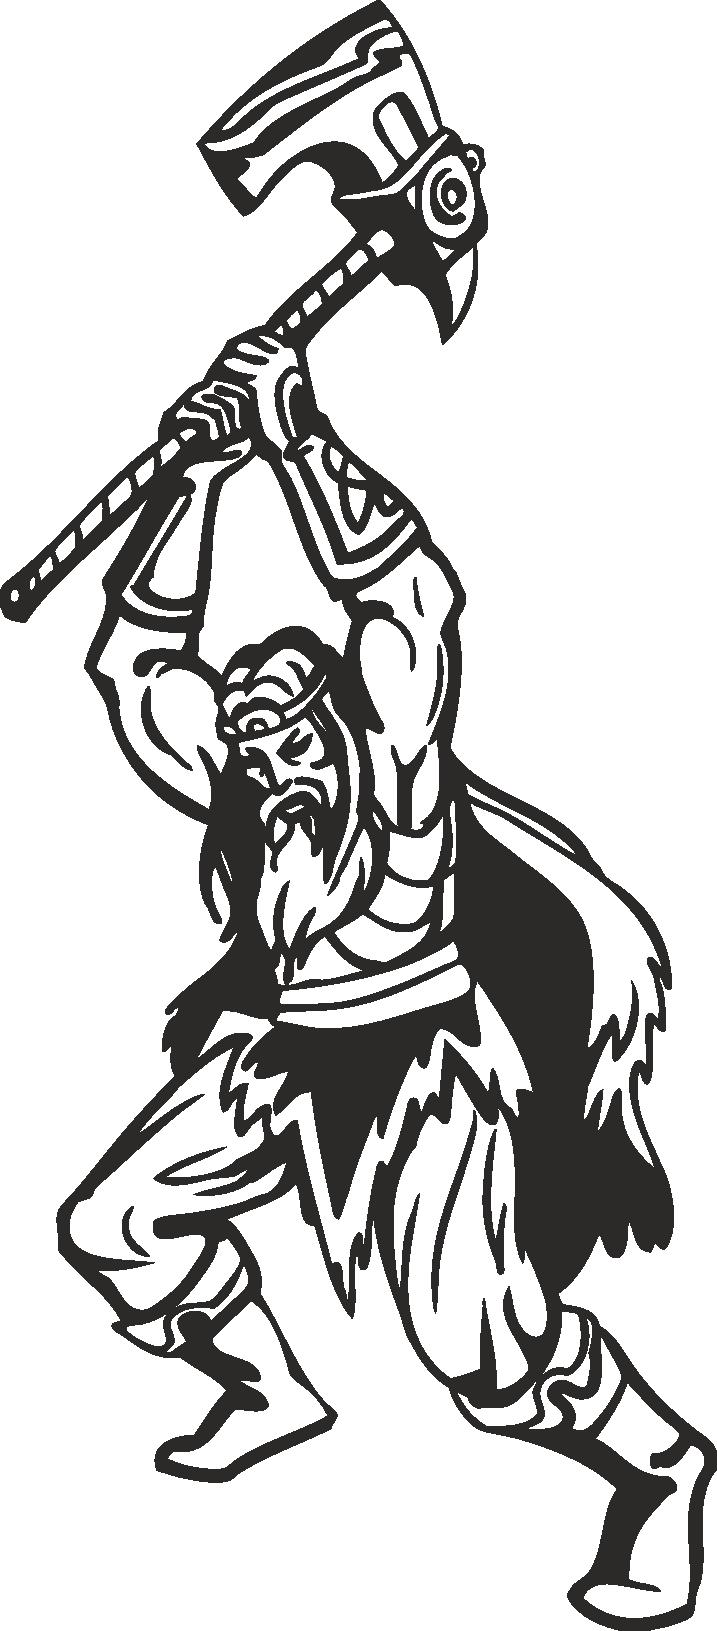 Warriors Vikings Vector 04 Free DXF File